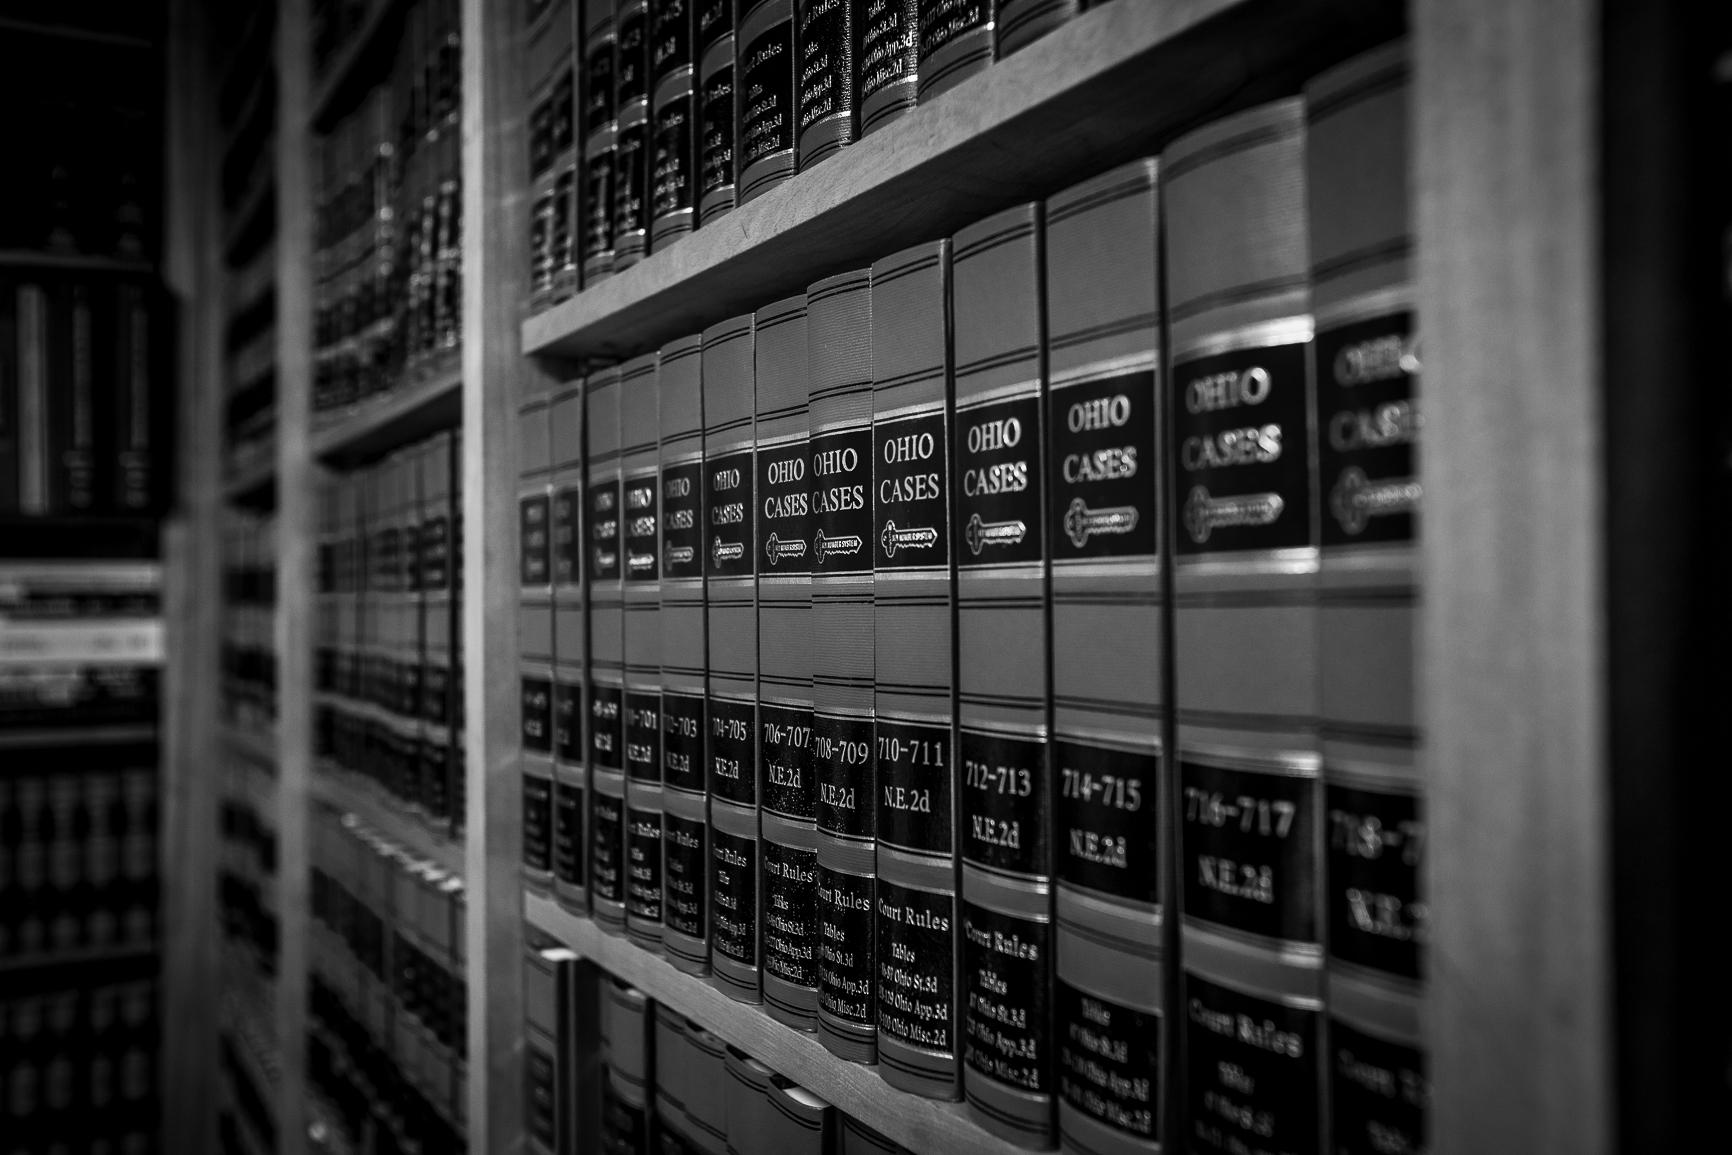 LibraryBooks5.jpg